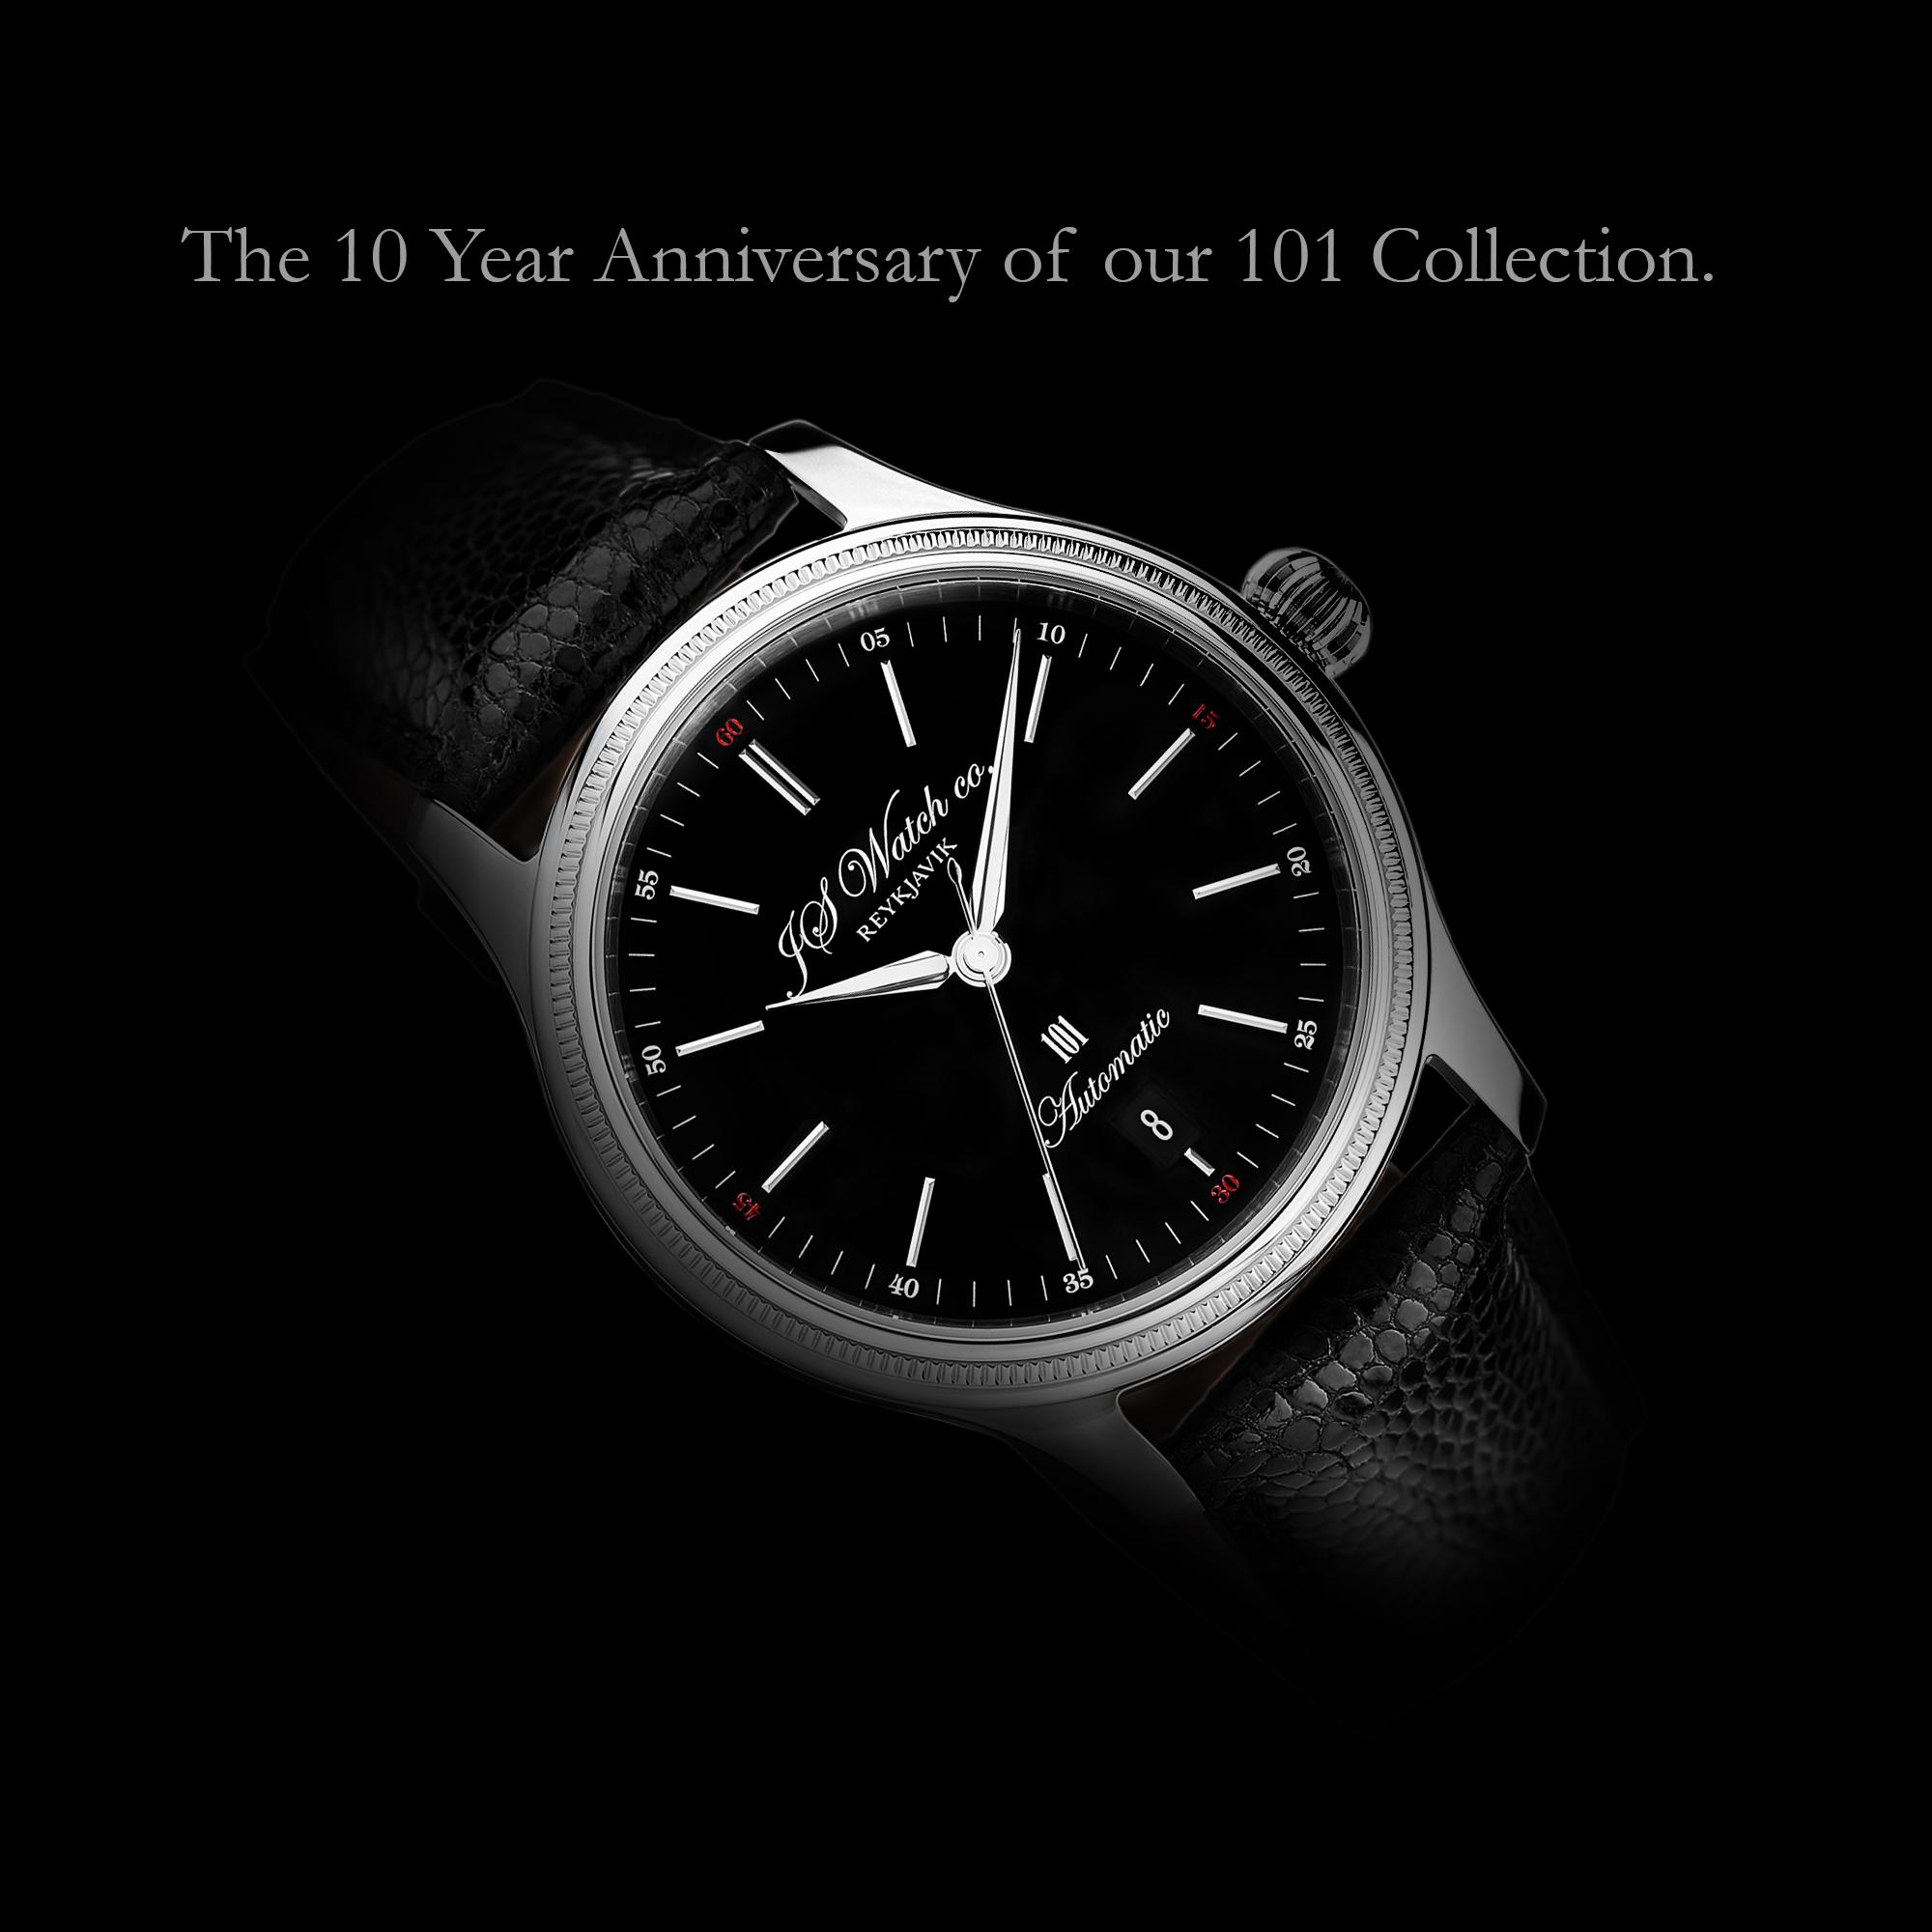 101 10 Year edition